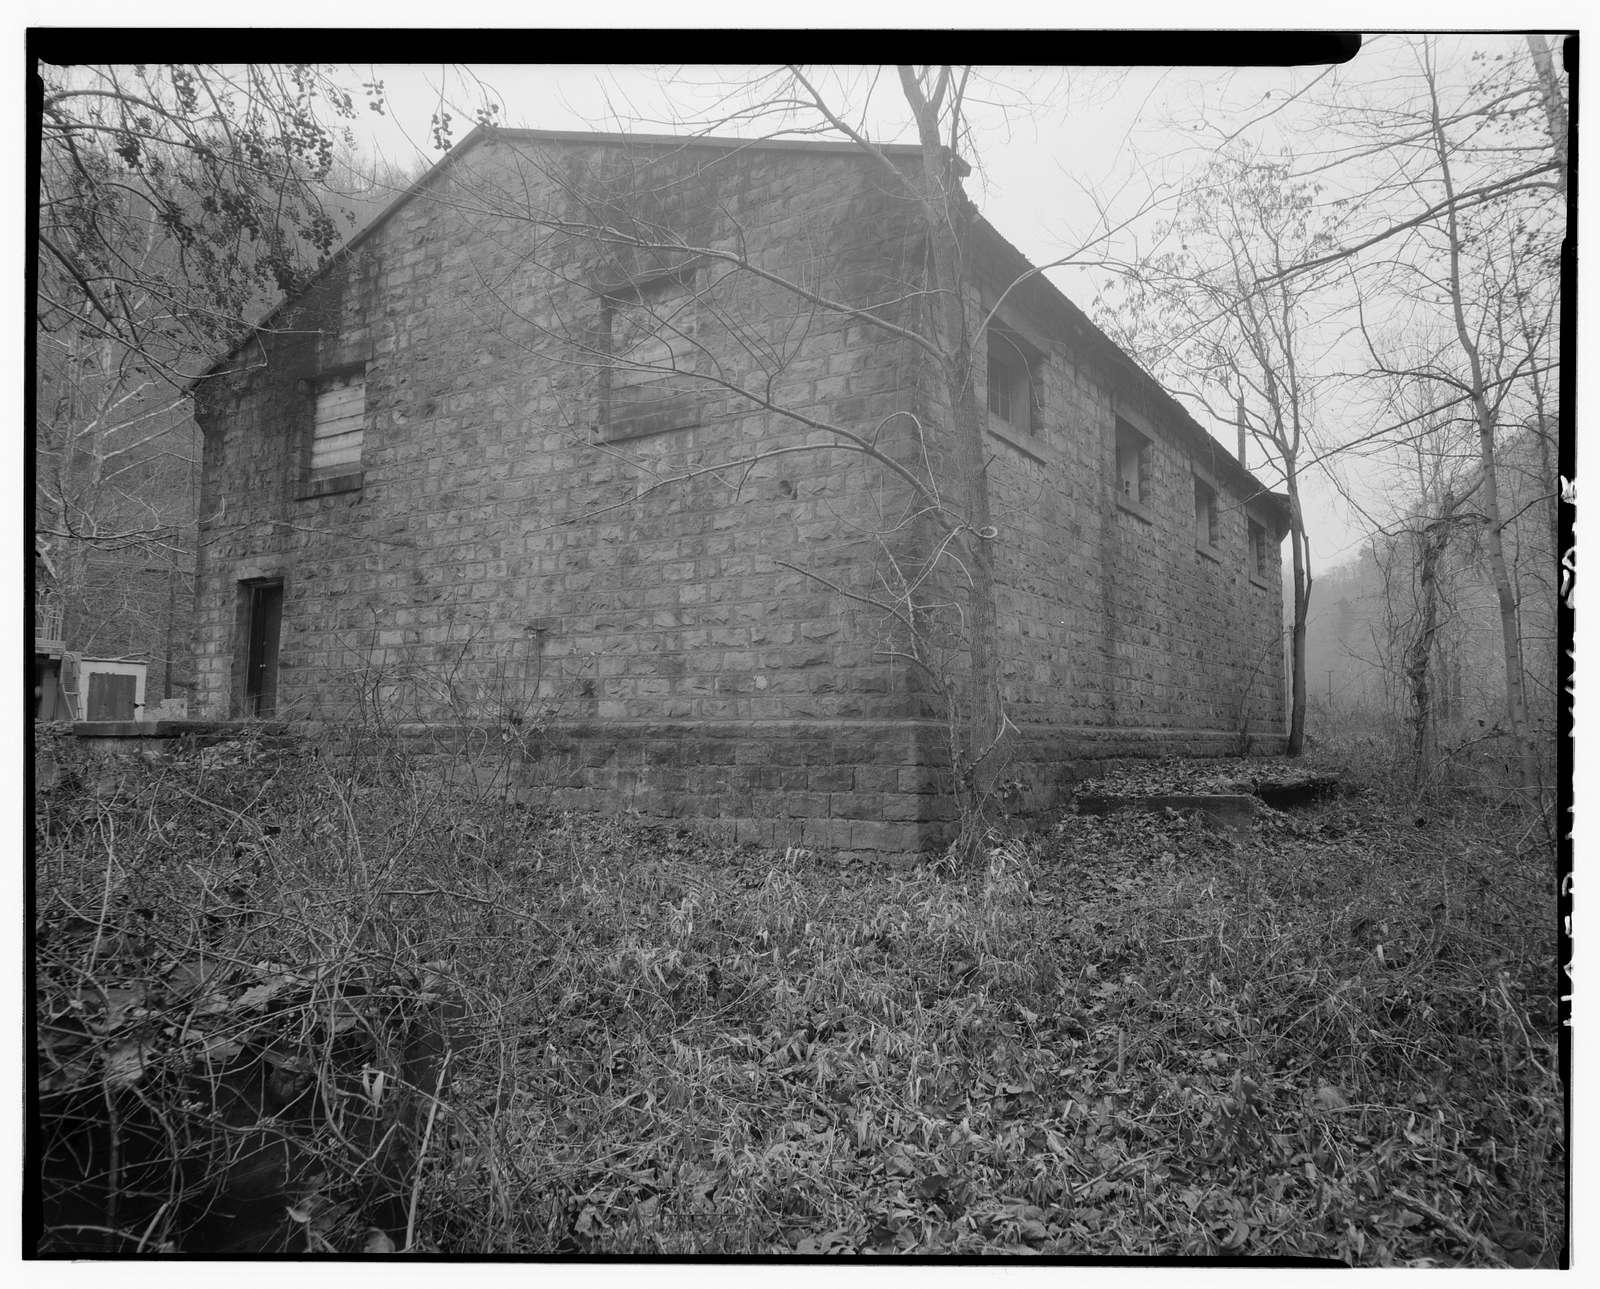 Ethel Coal Company & Supply Building, Left fork of Dingess Run (Ethel Hollow), Ethel, Logan County, WV